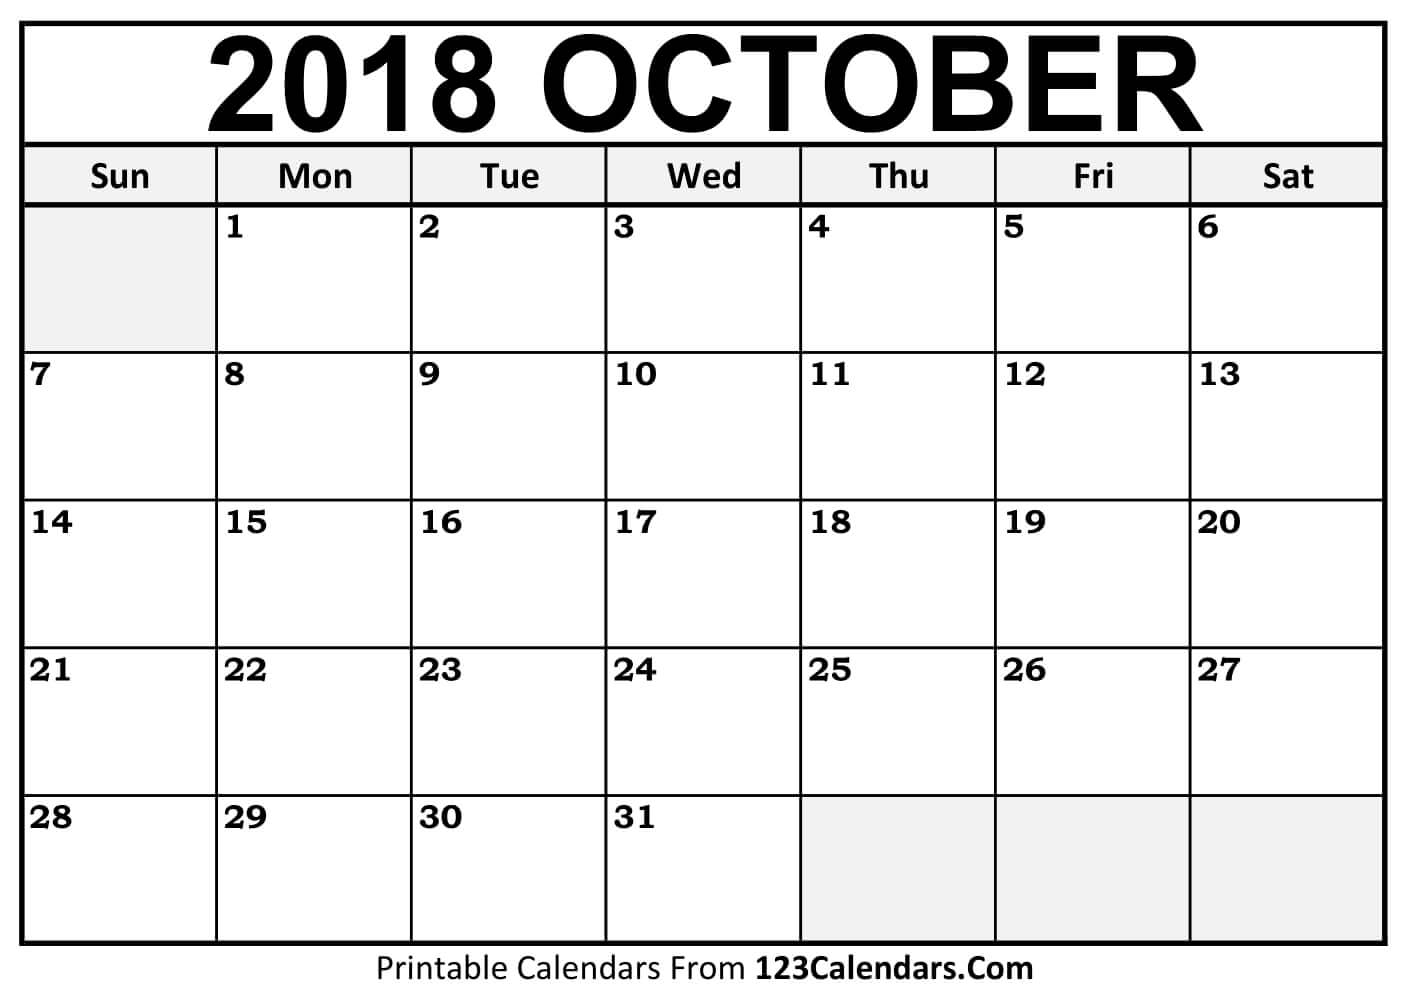 October 2018 Activity Calendar